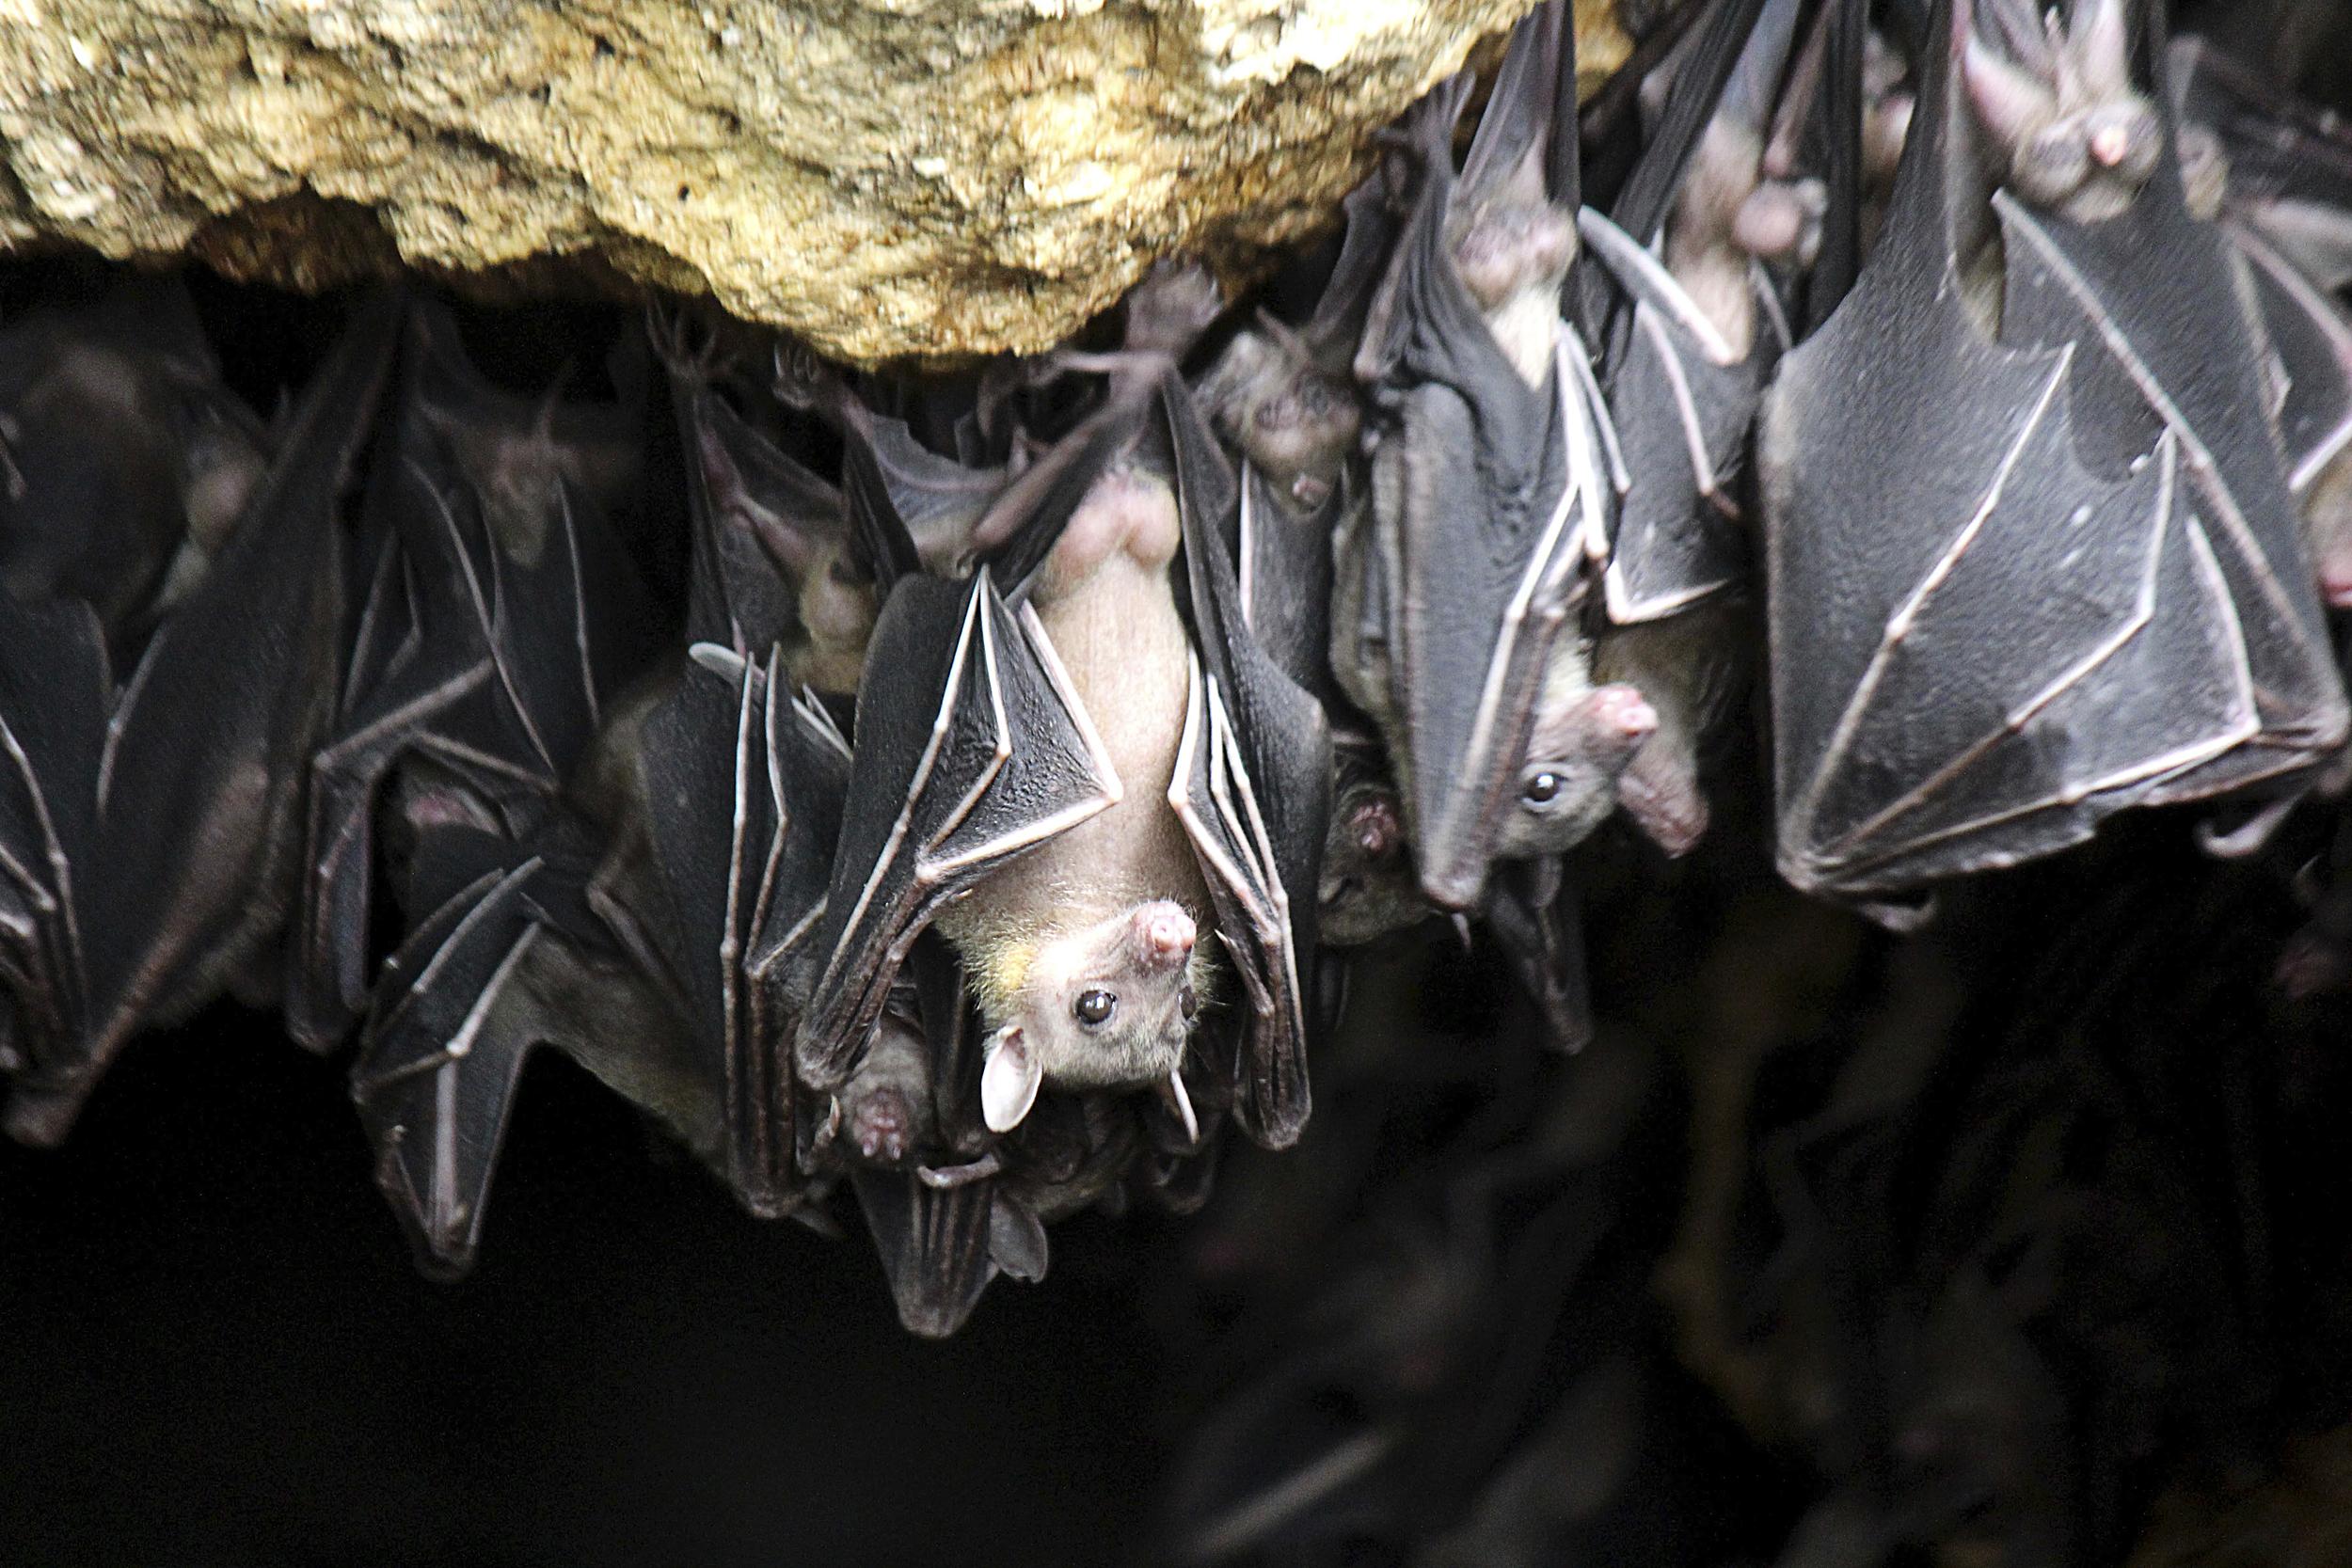 I Bat rabies alert saves swiss tourists who found sick bat in florida